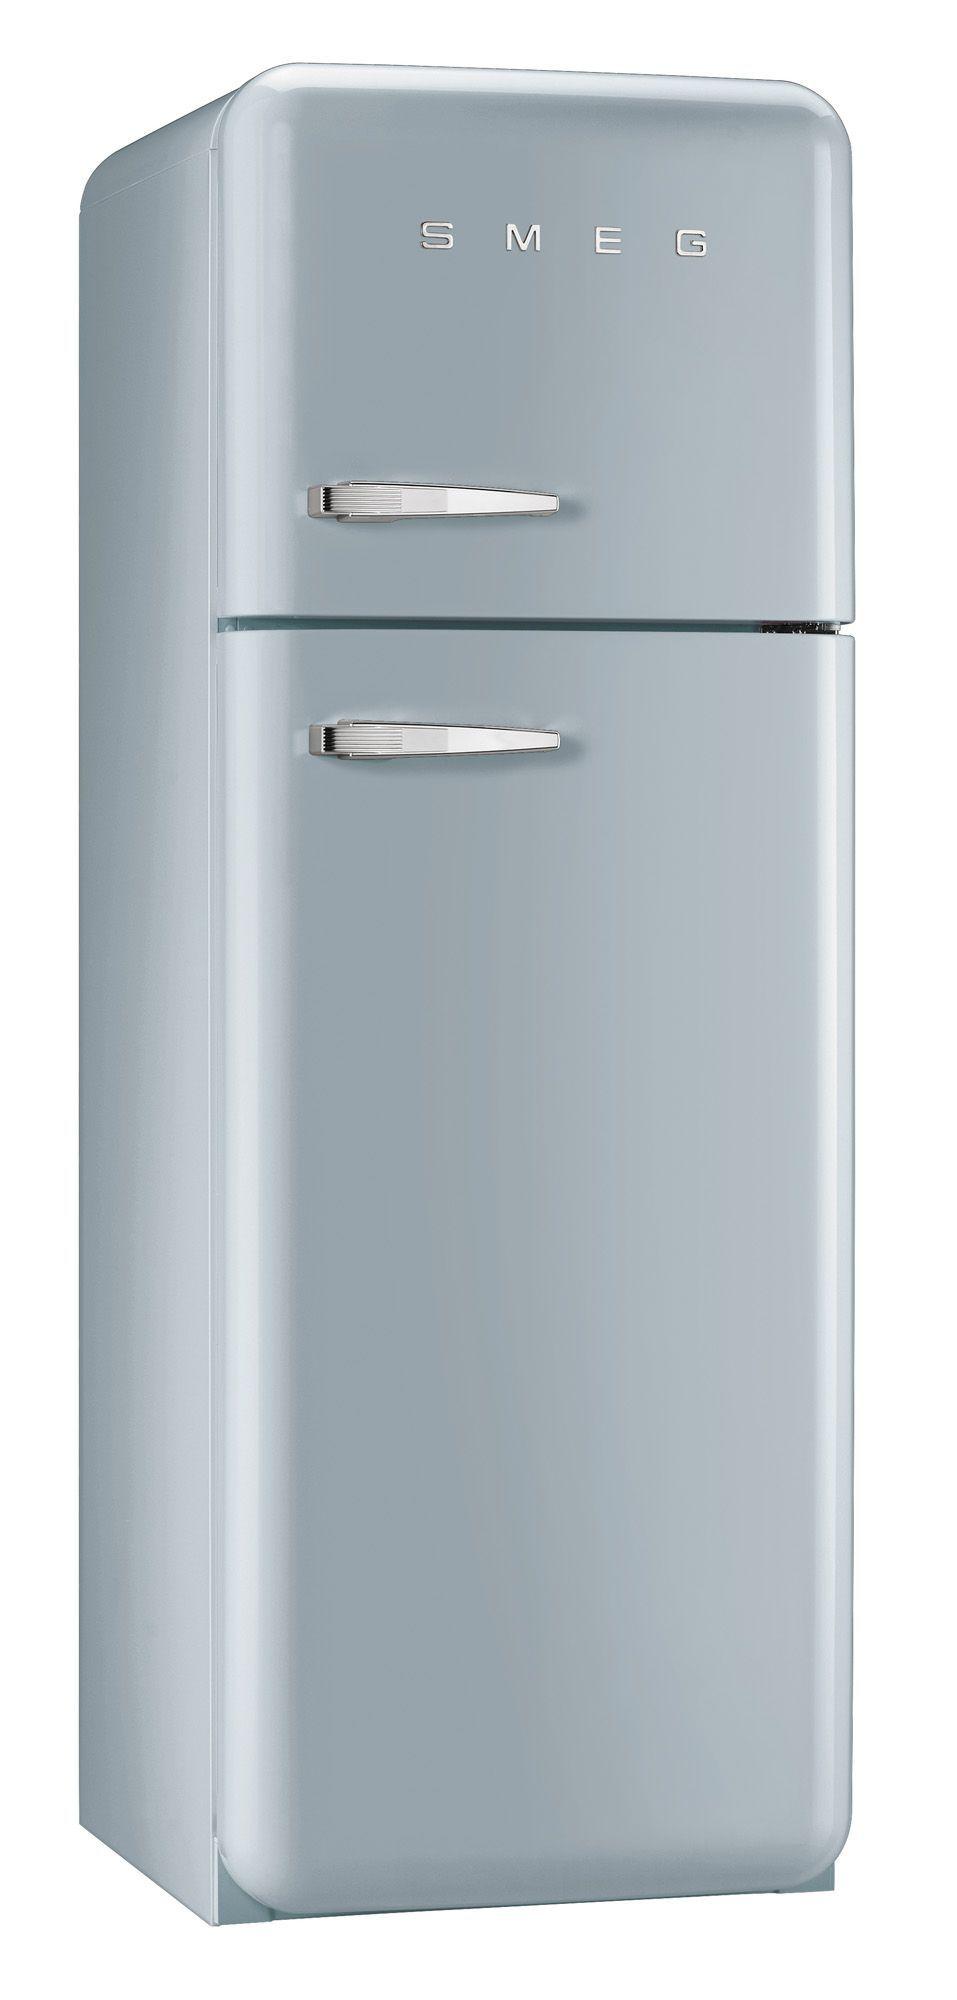 Smeg FAB30RFS Silver Freestanding Fridge Freezer | Departments | DIY ...